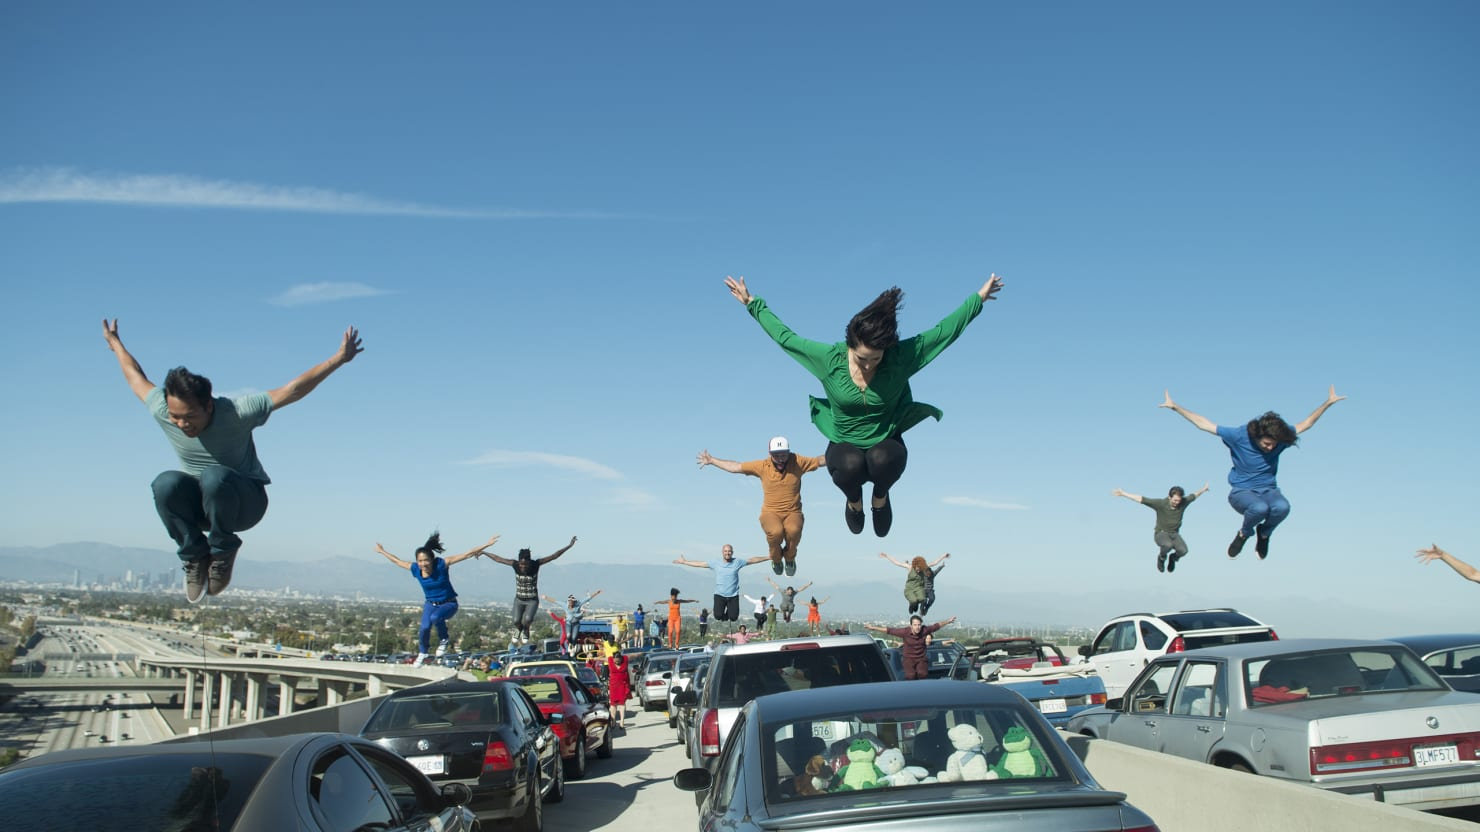 How 'La La Land' Staged a Dance Number on an L.A. Freeway